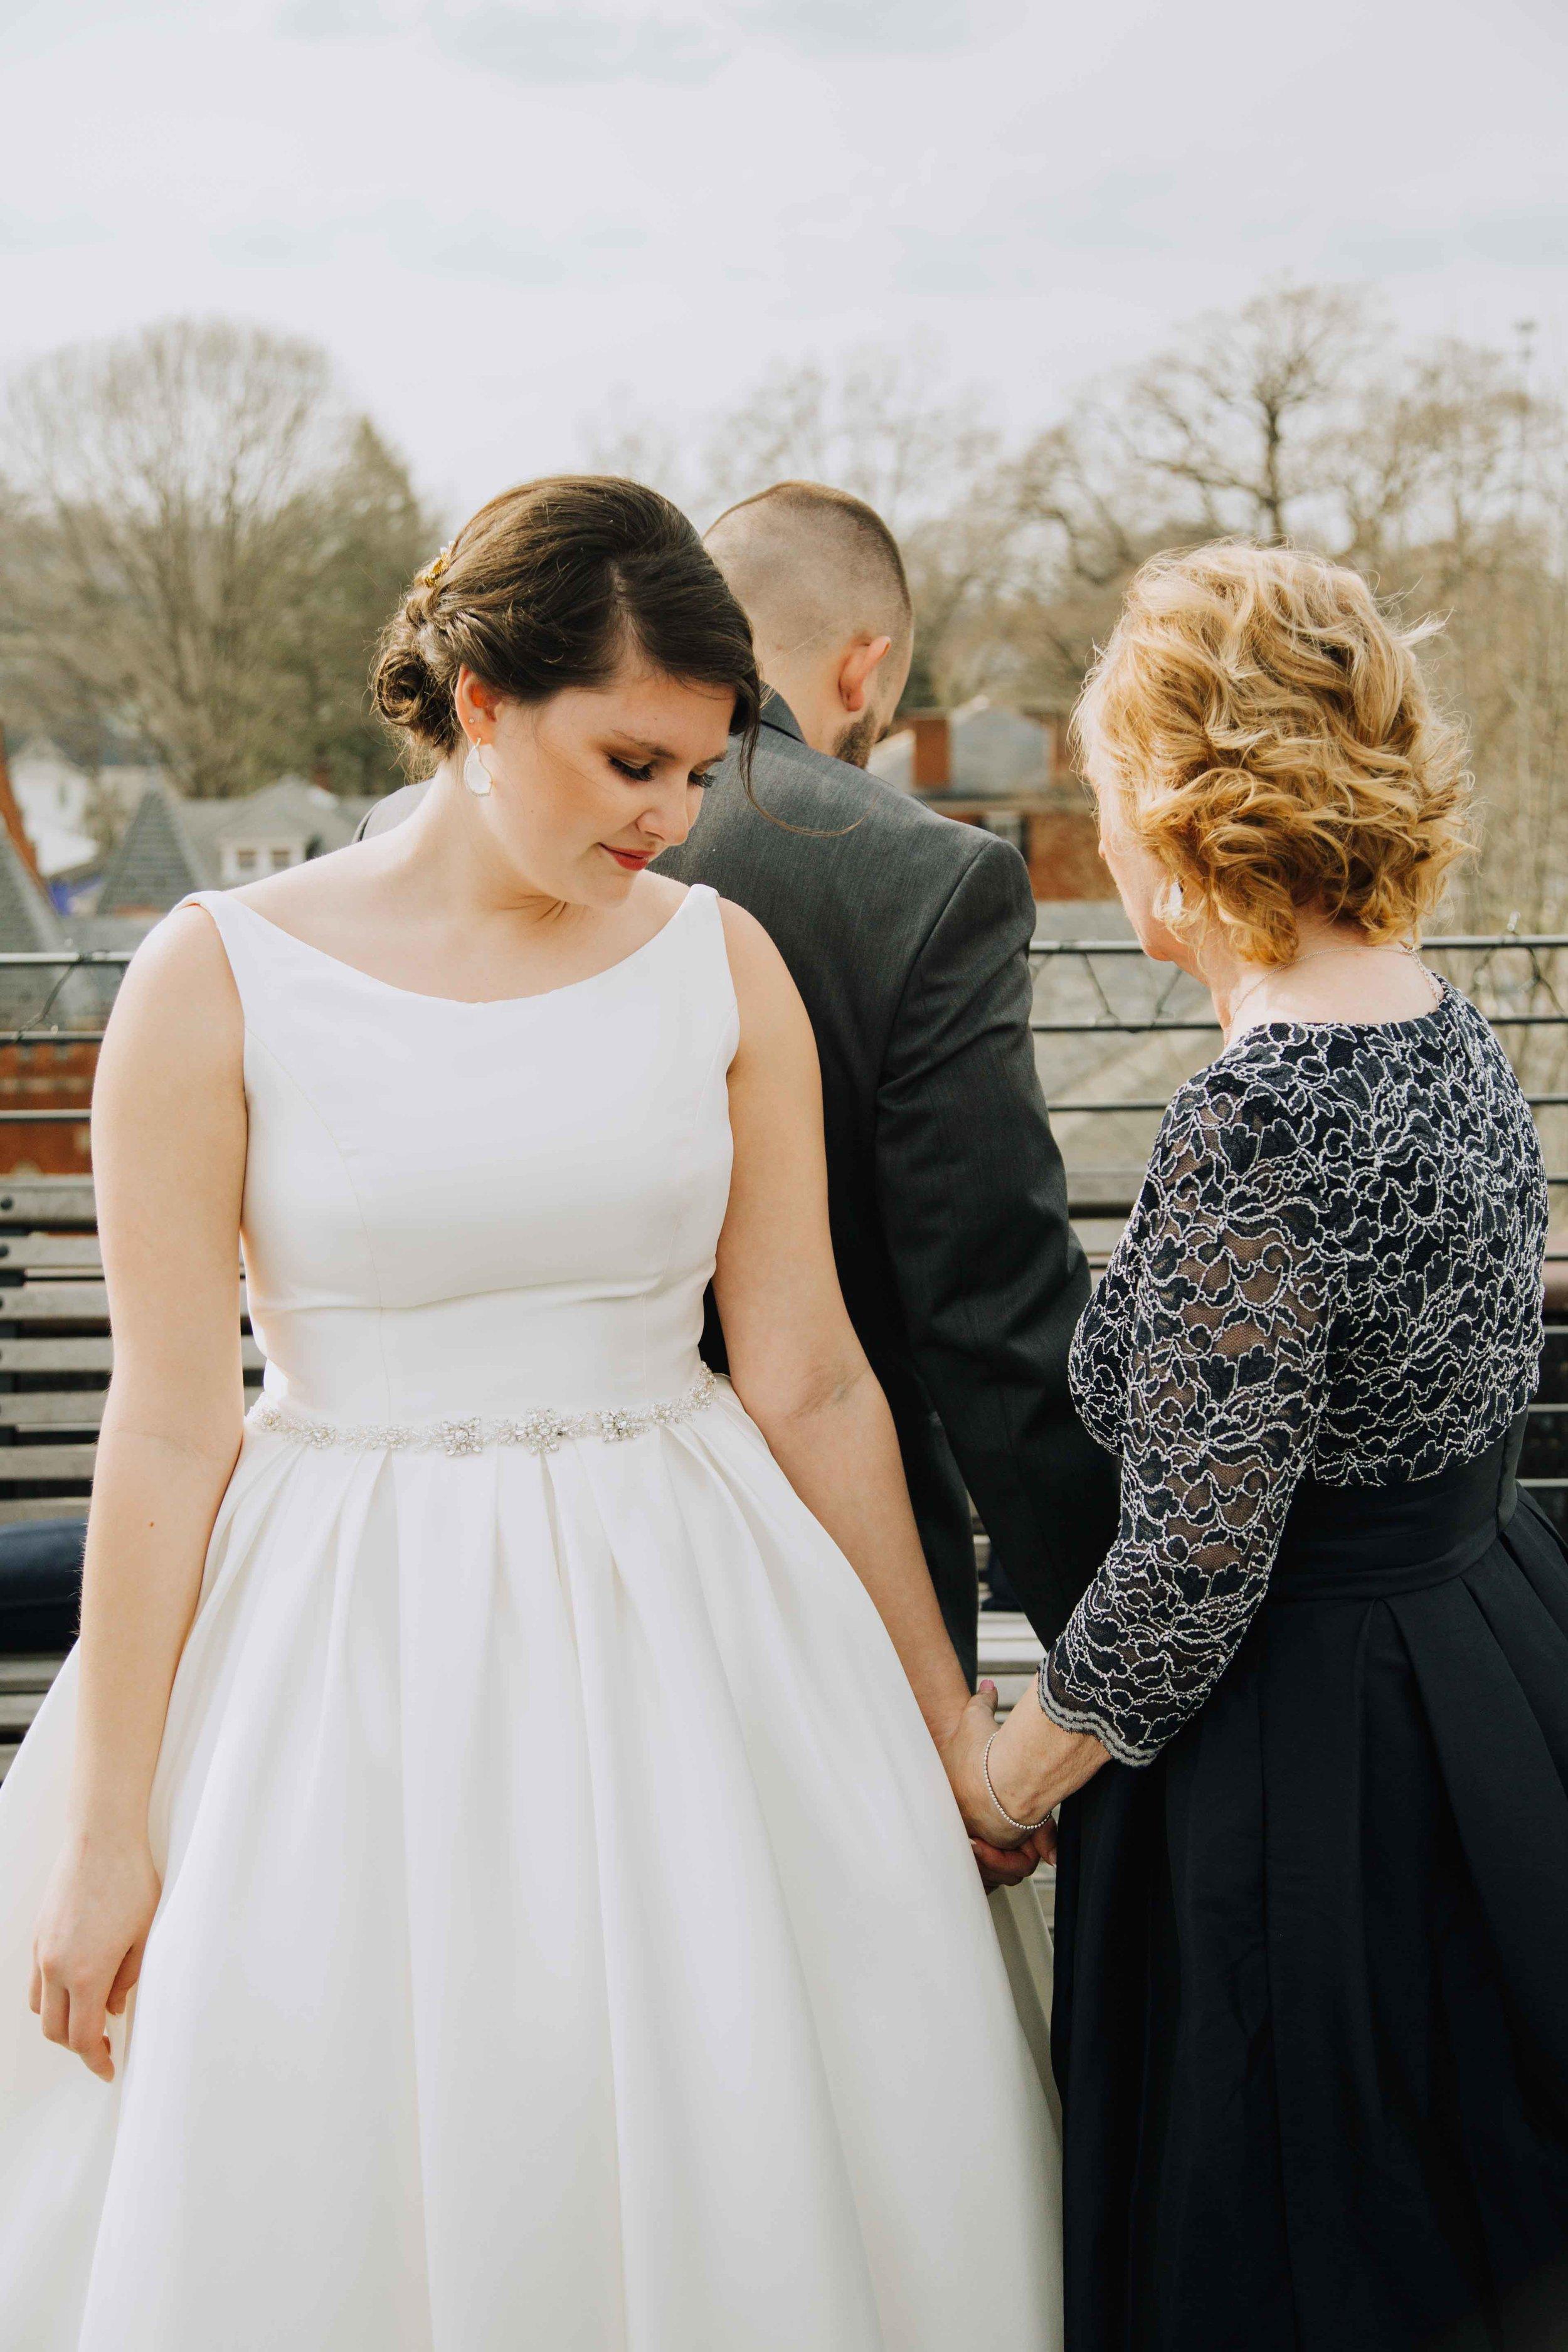 Farmville-Virginia-Wedding-Hotel-Weynoke-Downtown-Jacqueline-Waters-Photography-Detailed- (571).jpg